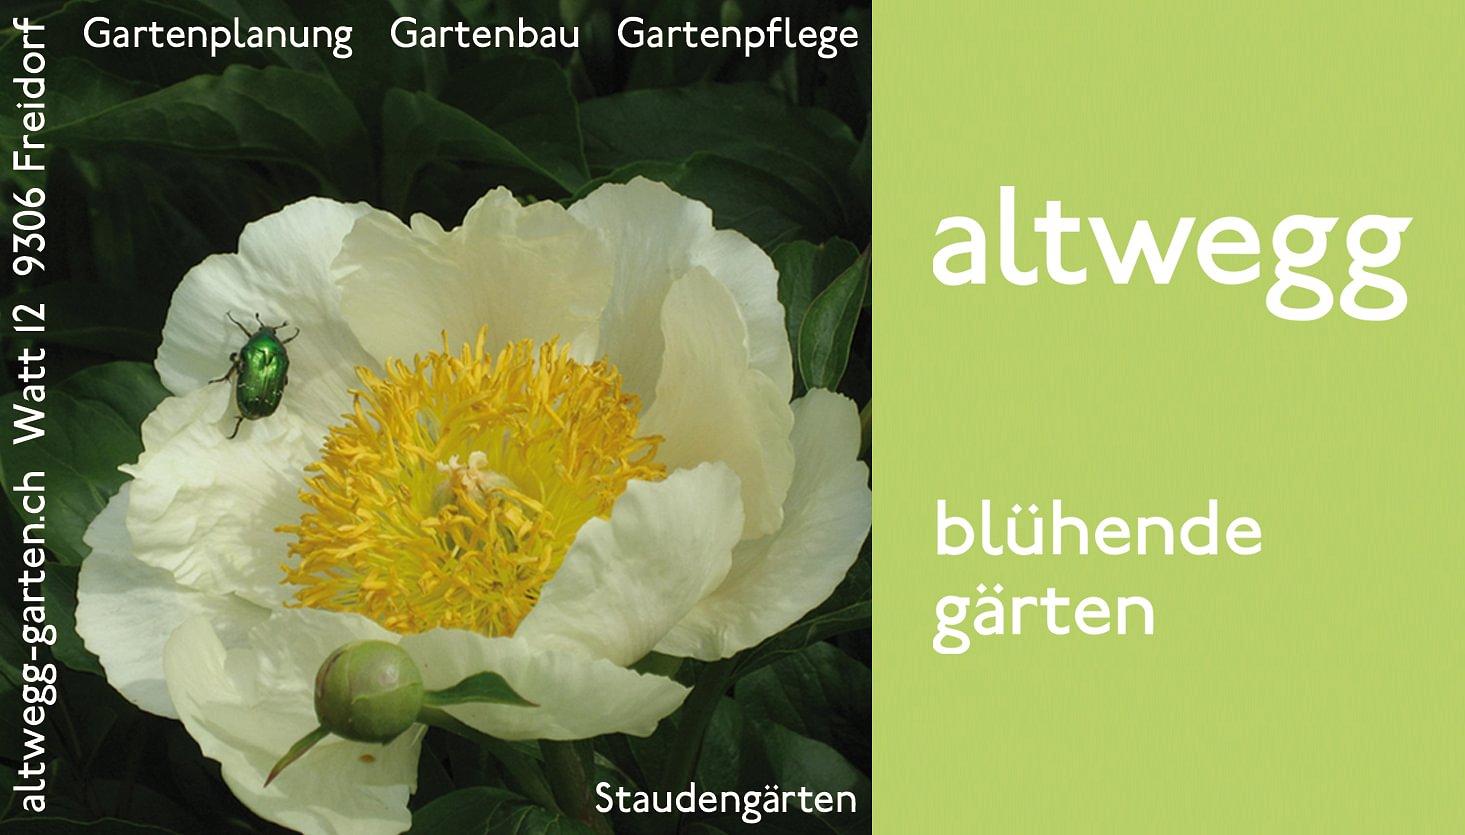 Altwegg blühende Gärten AG